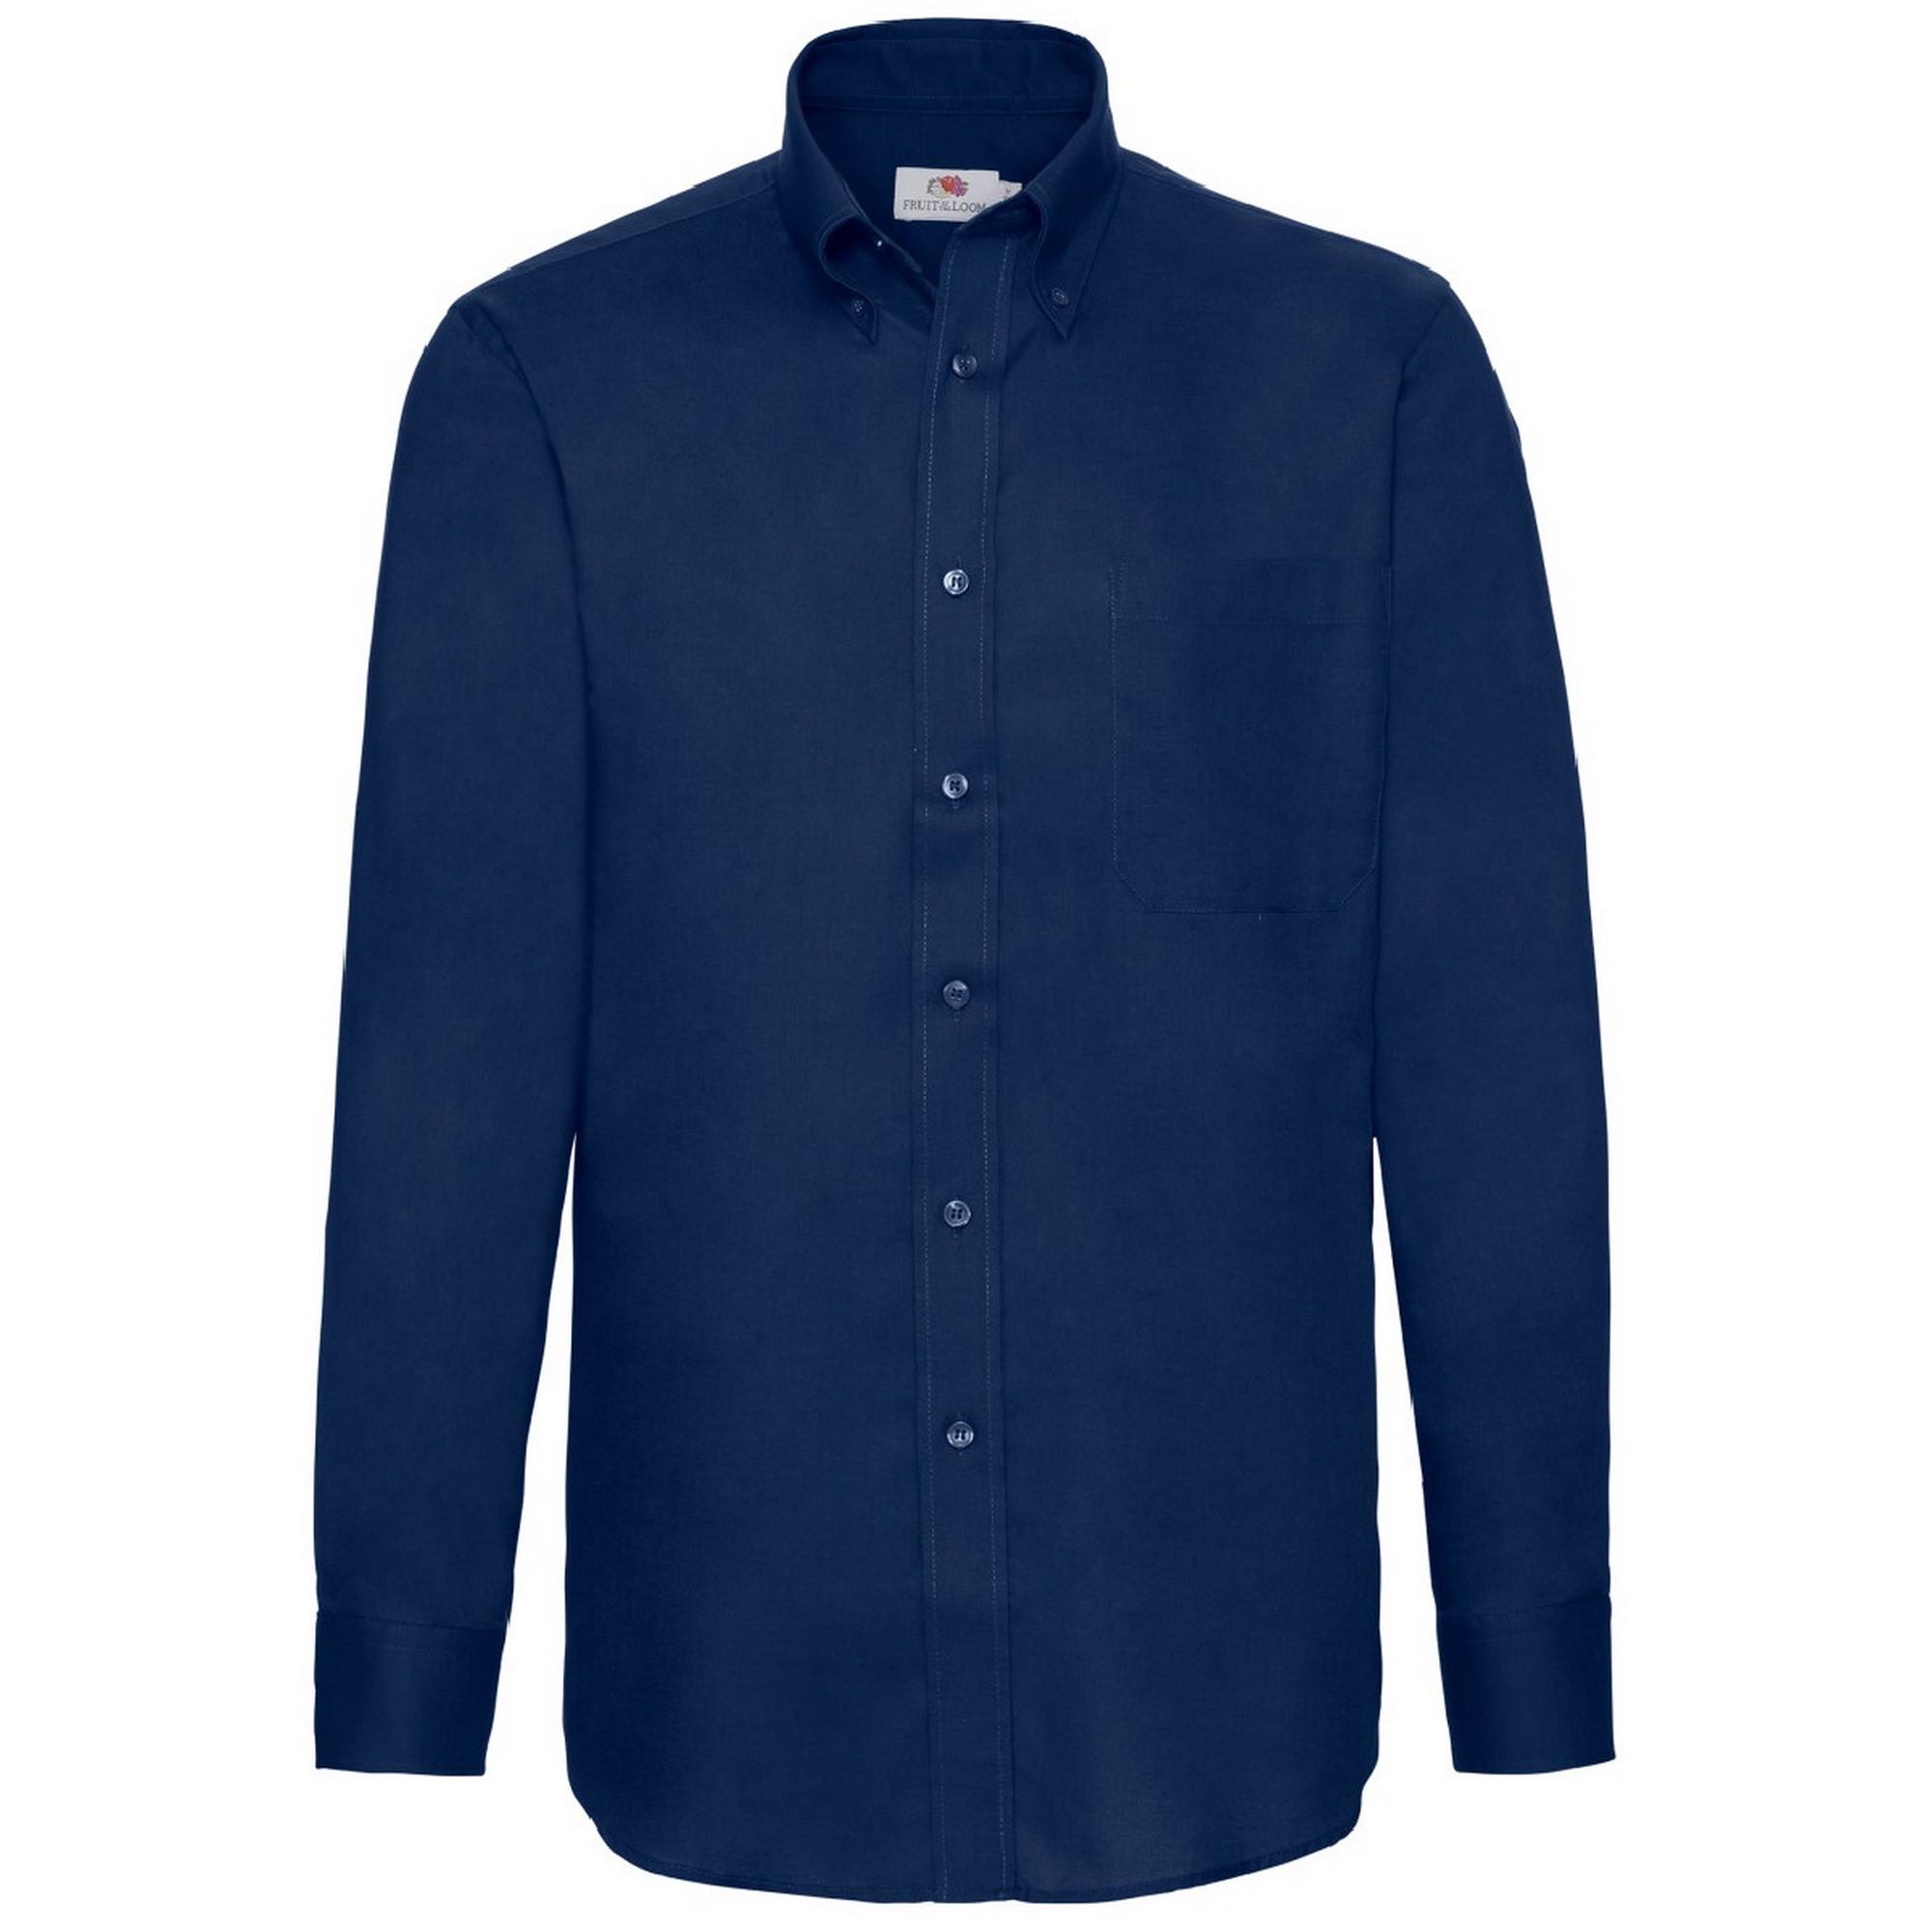 Fruit Of The Loom Mens Long Sleeve Oxford Shirt (XL) (Navy)